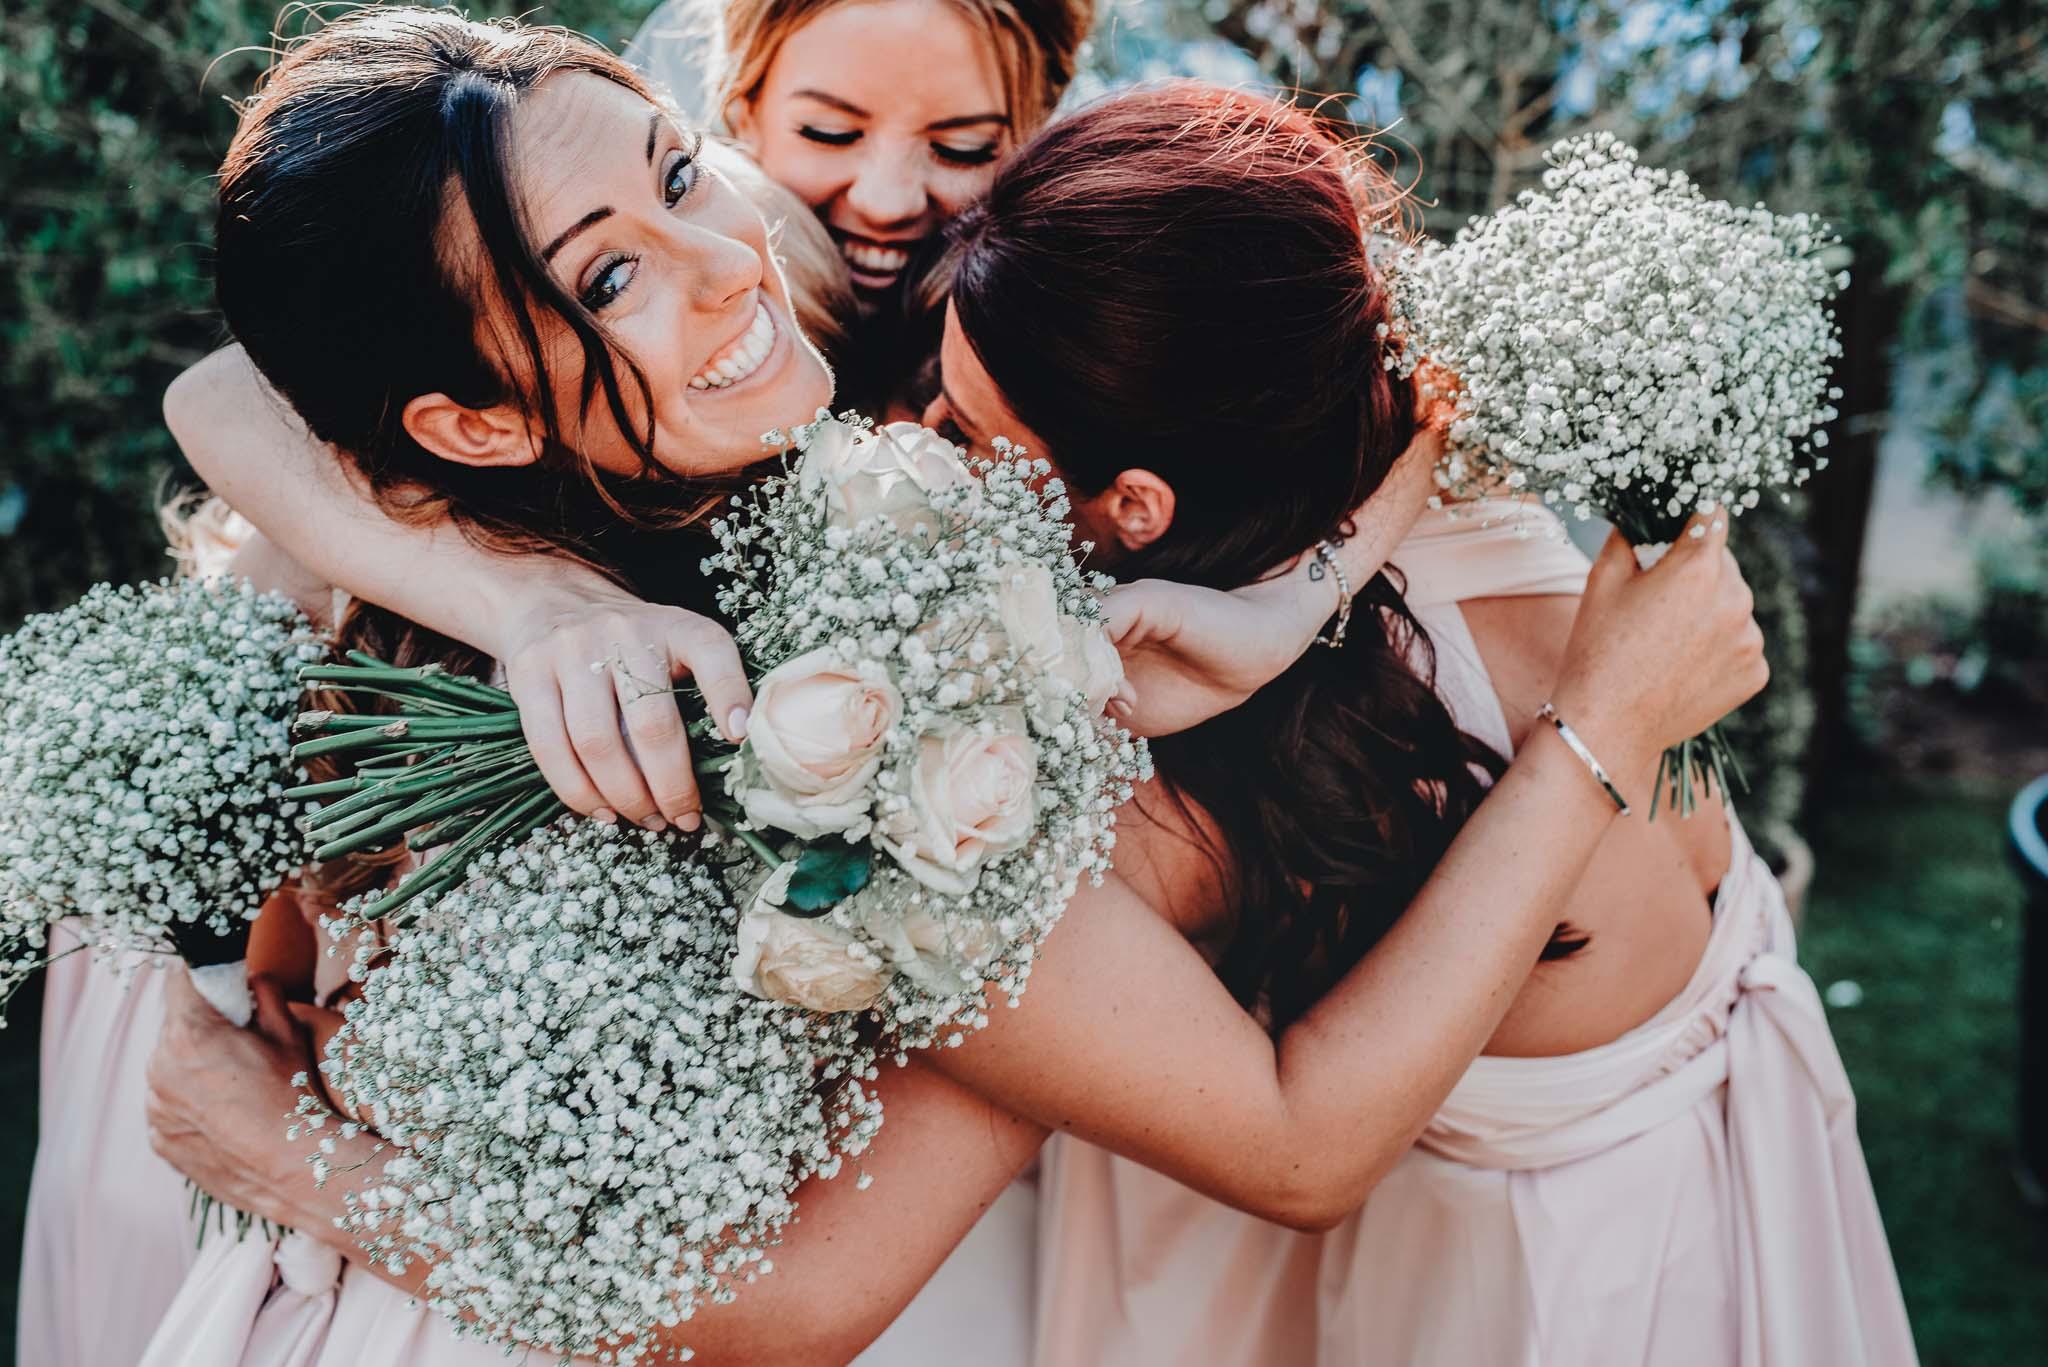 maid of honour duties, bridemaids, wedding photographer Aylesbury